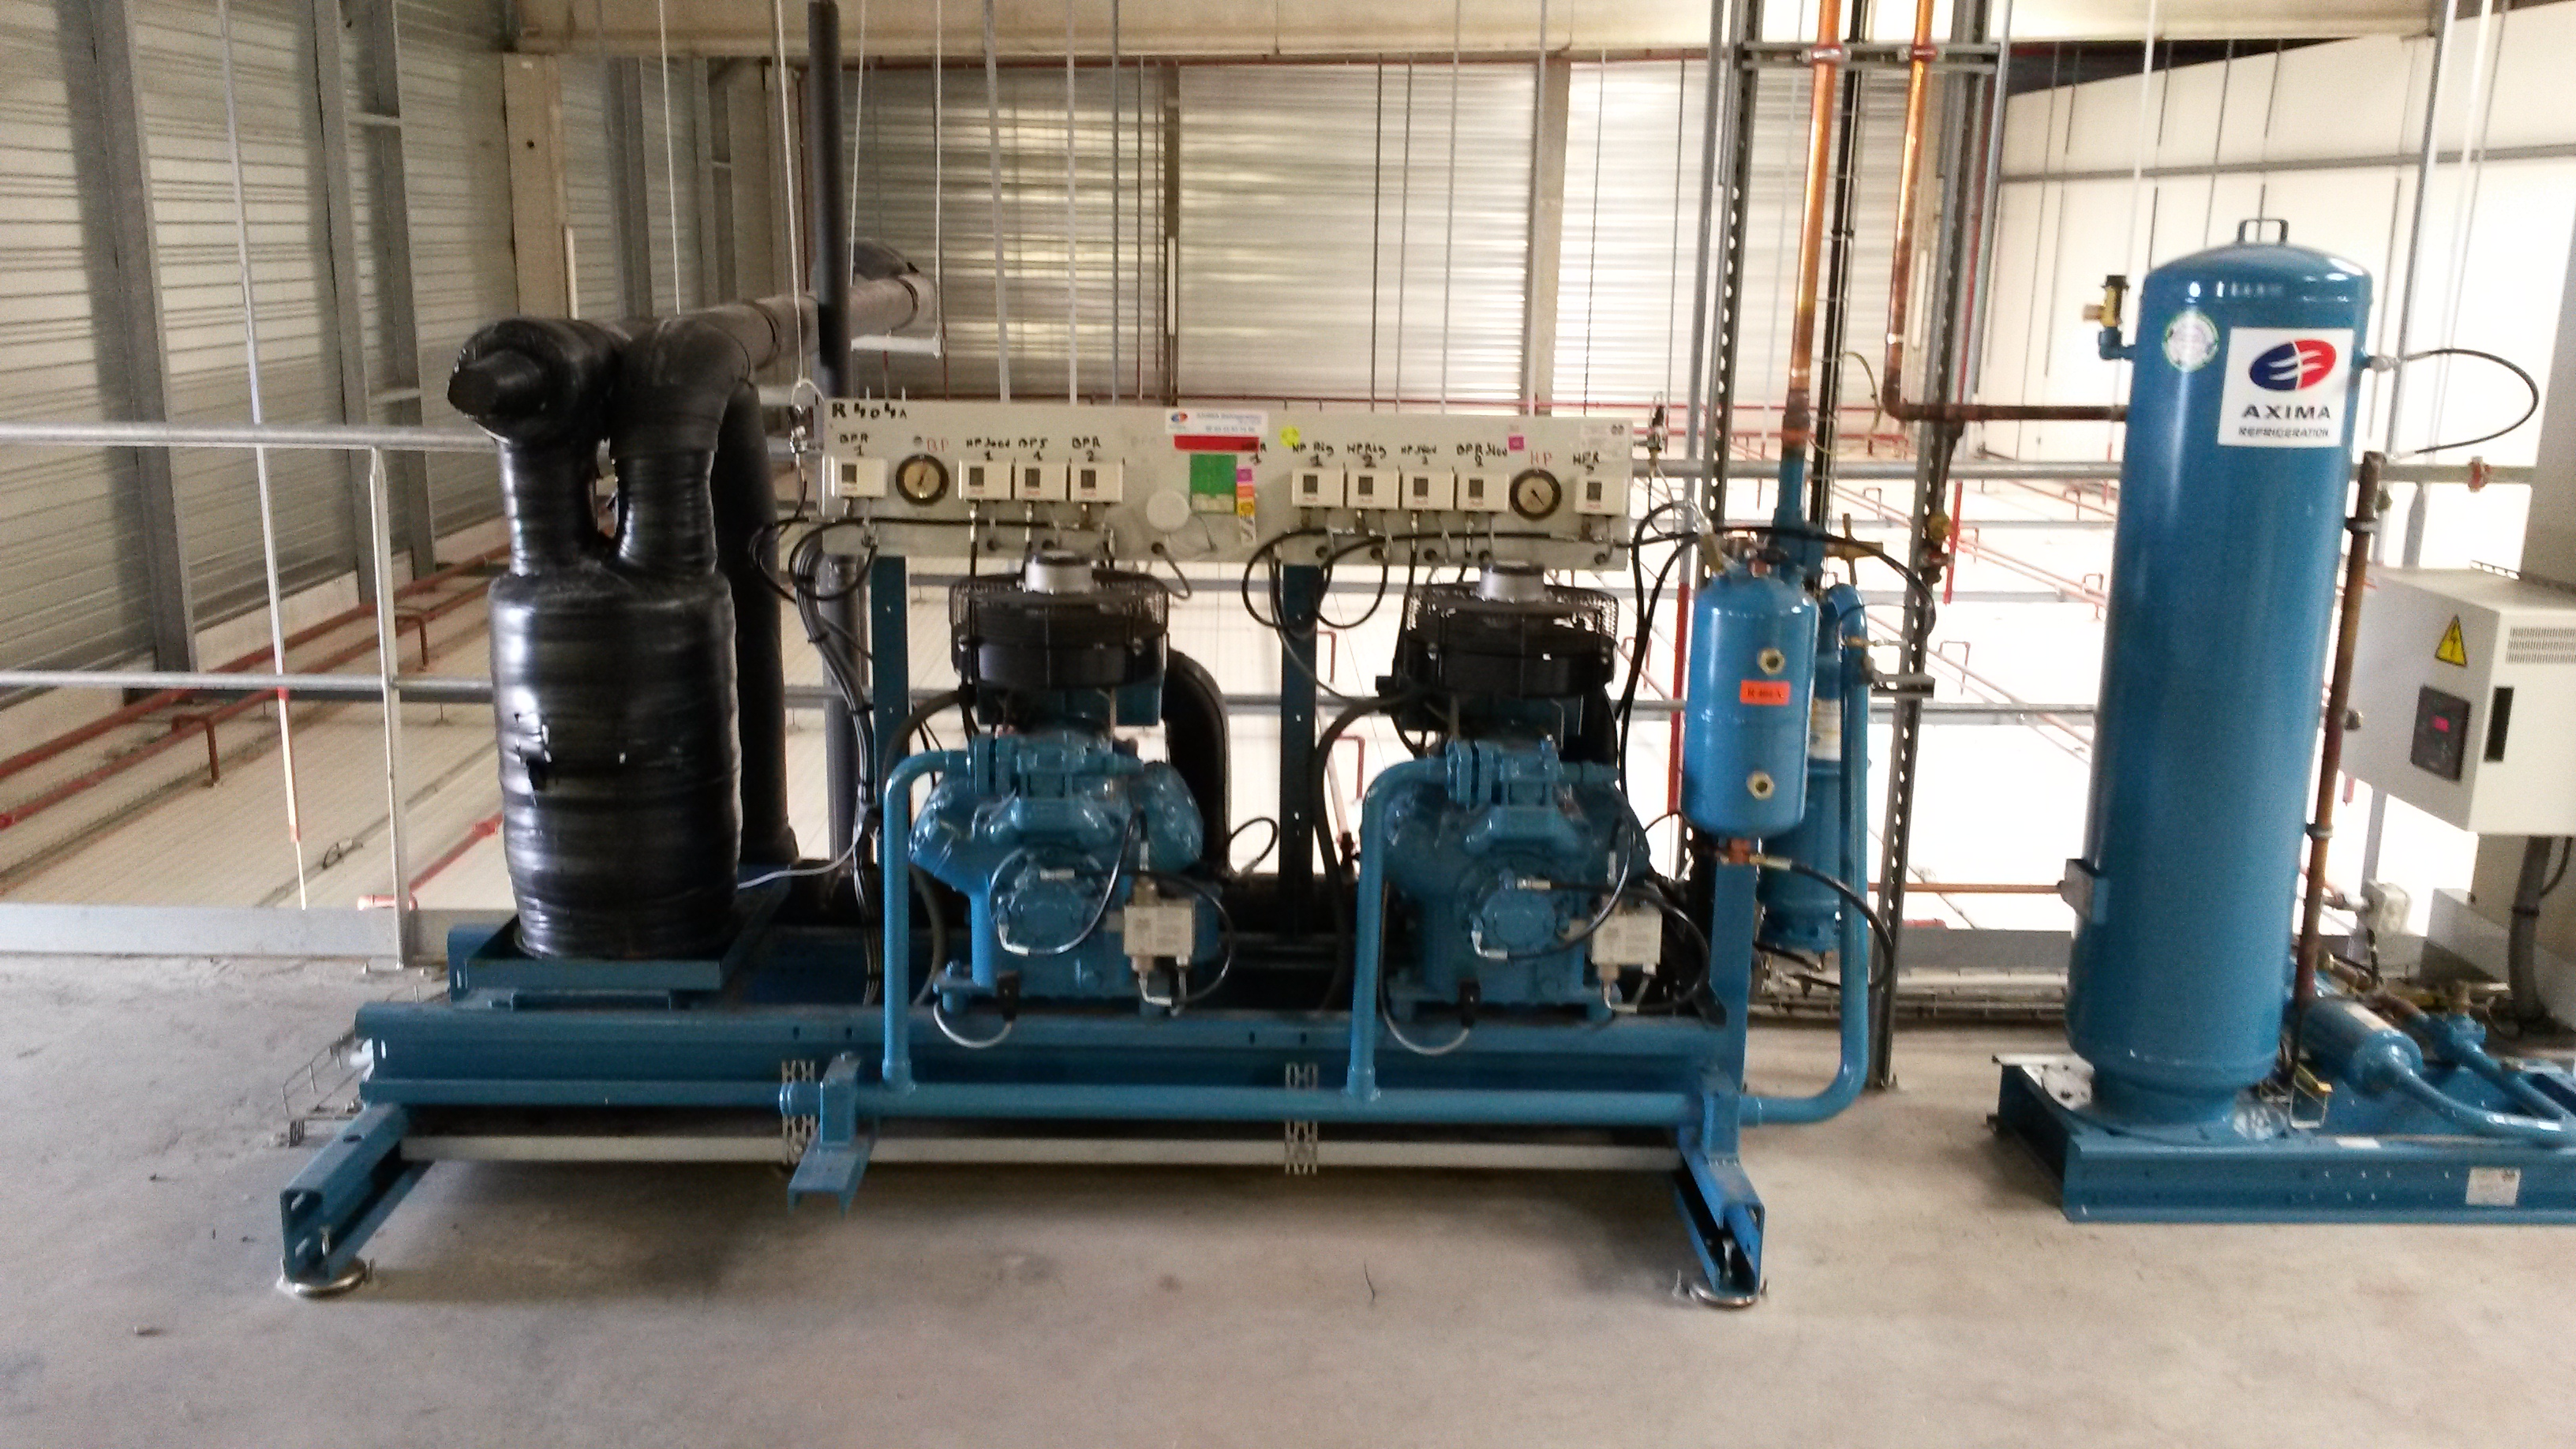 Centrale production froid profroid 52 kw condenseurs - Chambre froide d occasion belgique ...